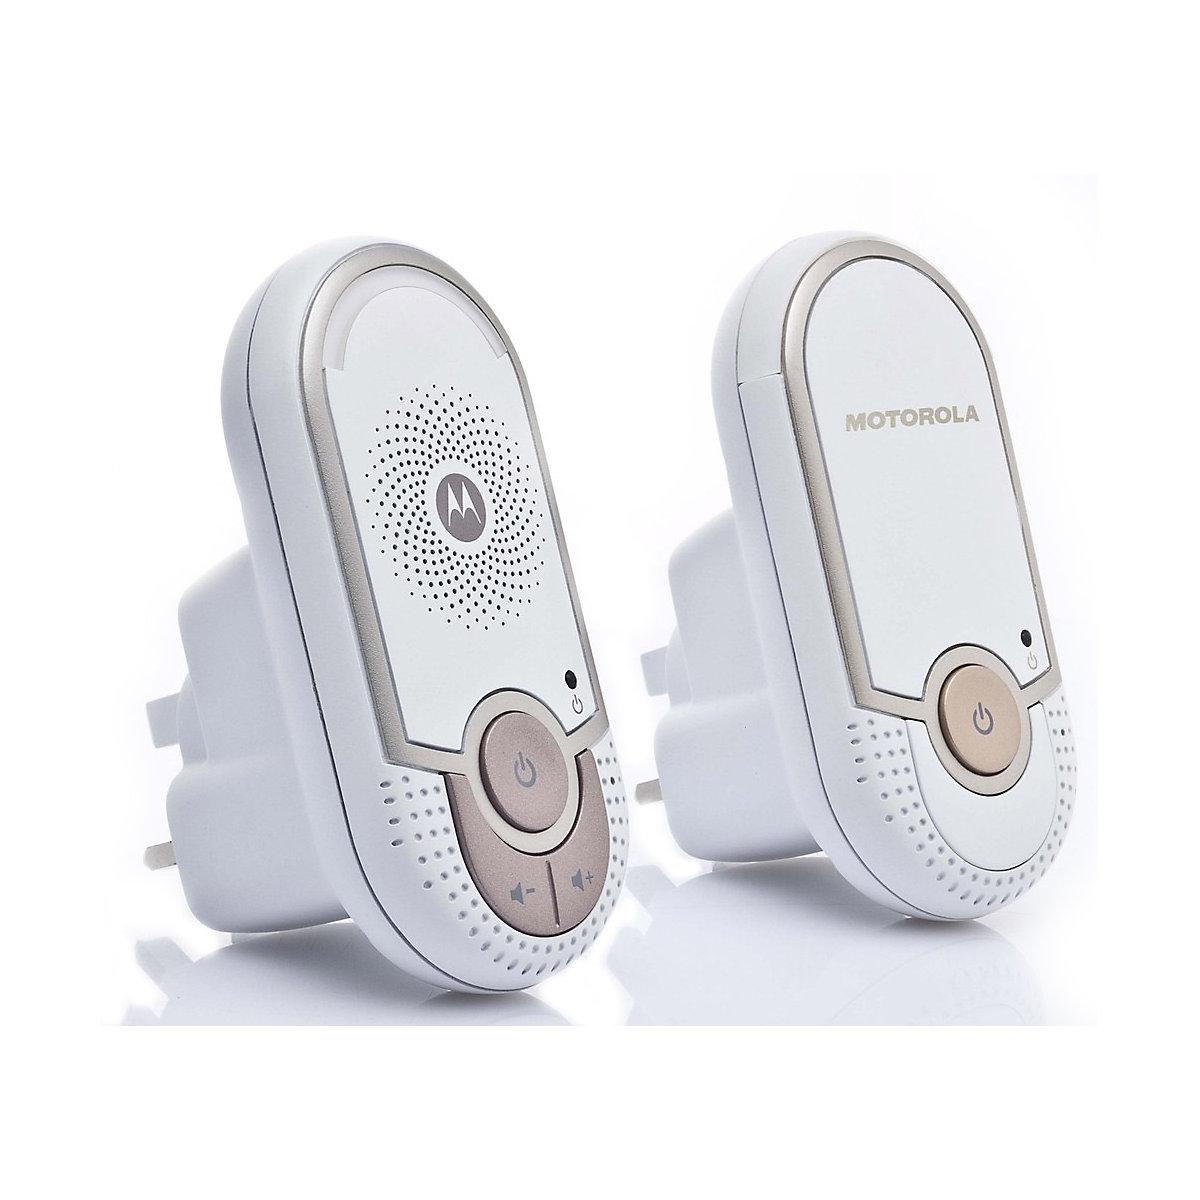 Motorola MBP8 digital audio monitor